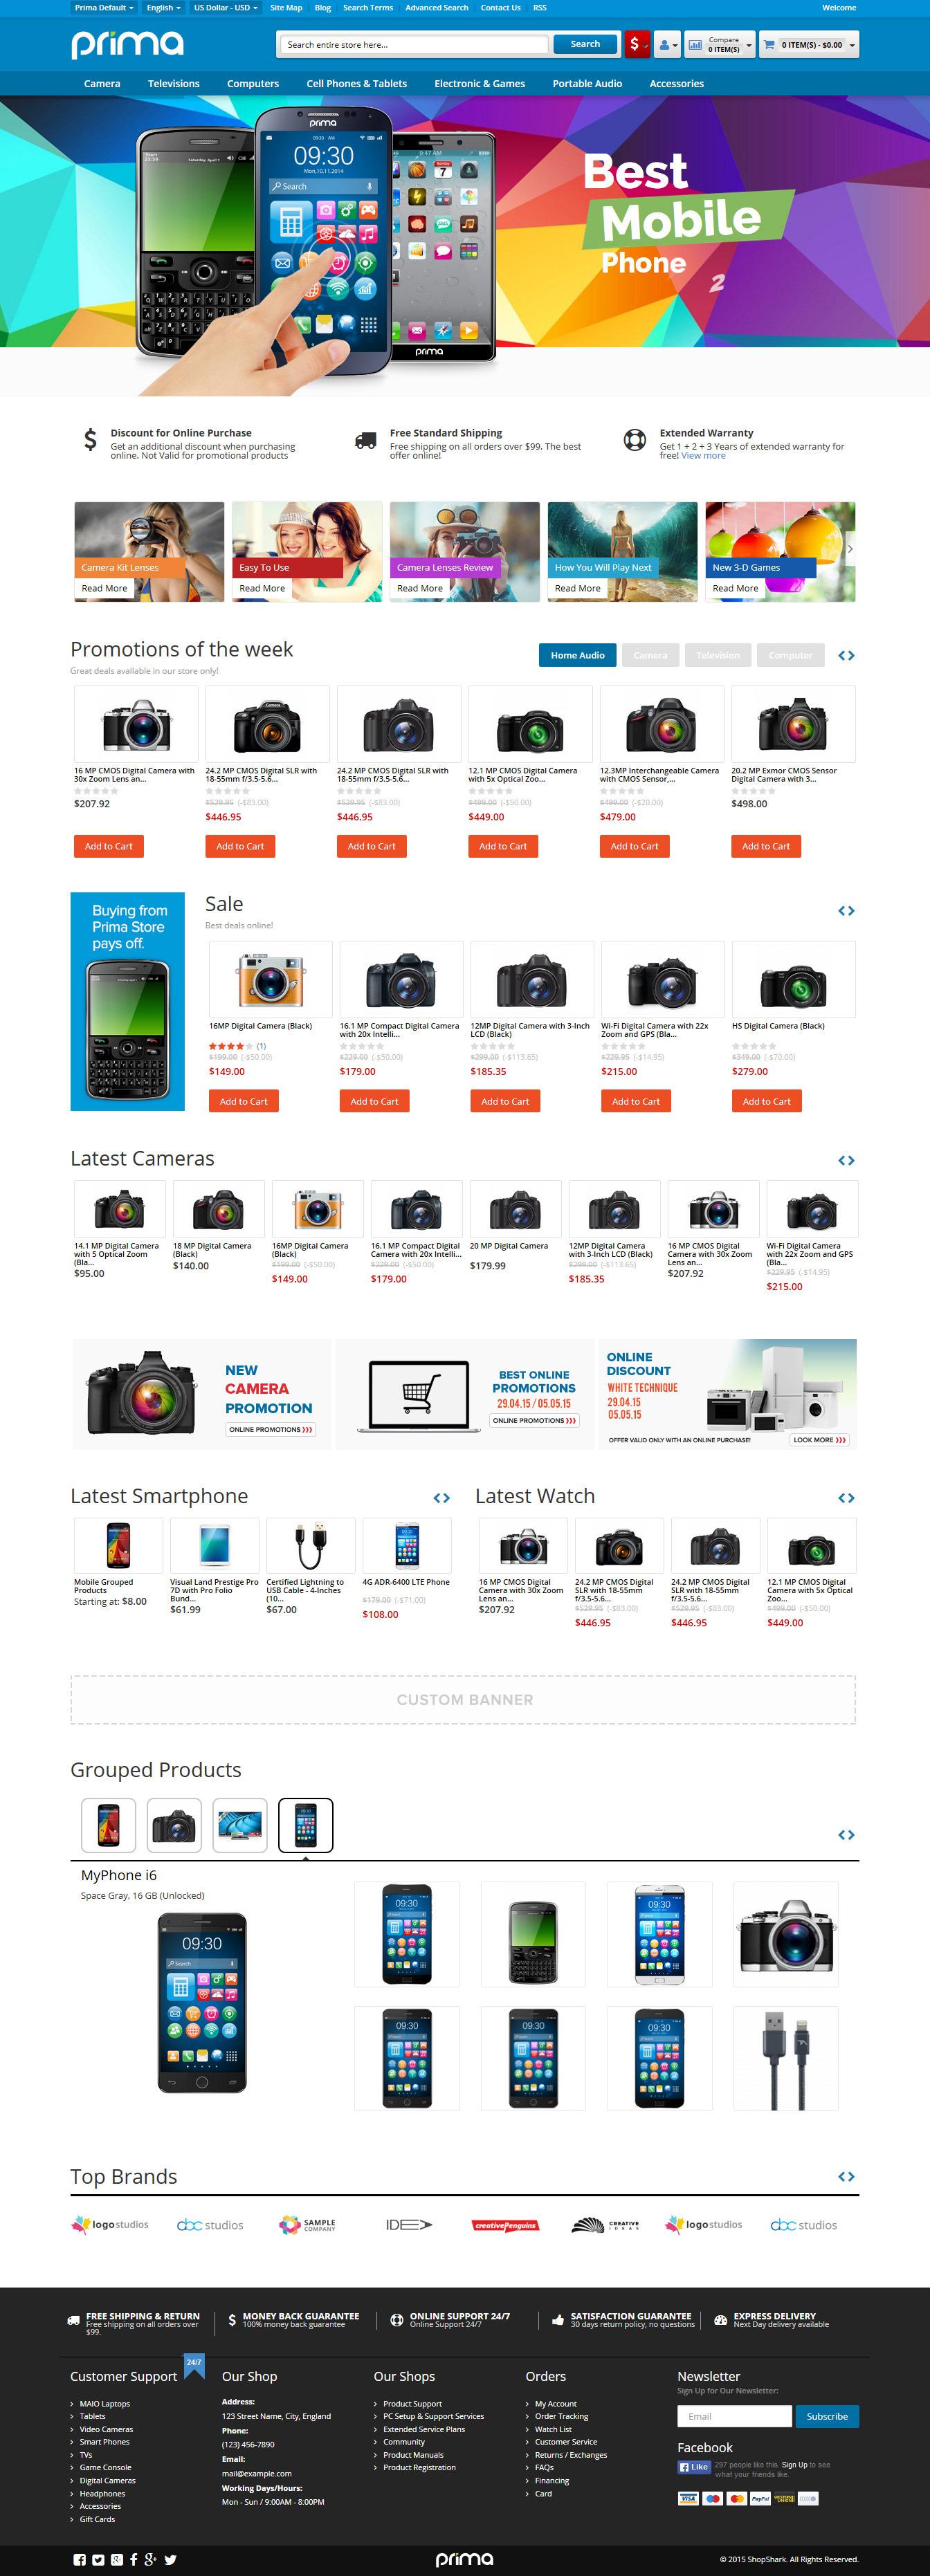 Prima - Responsive Magento Theme by ShopShark | ThemeForest